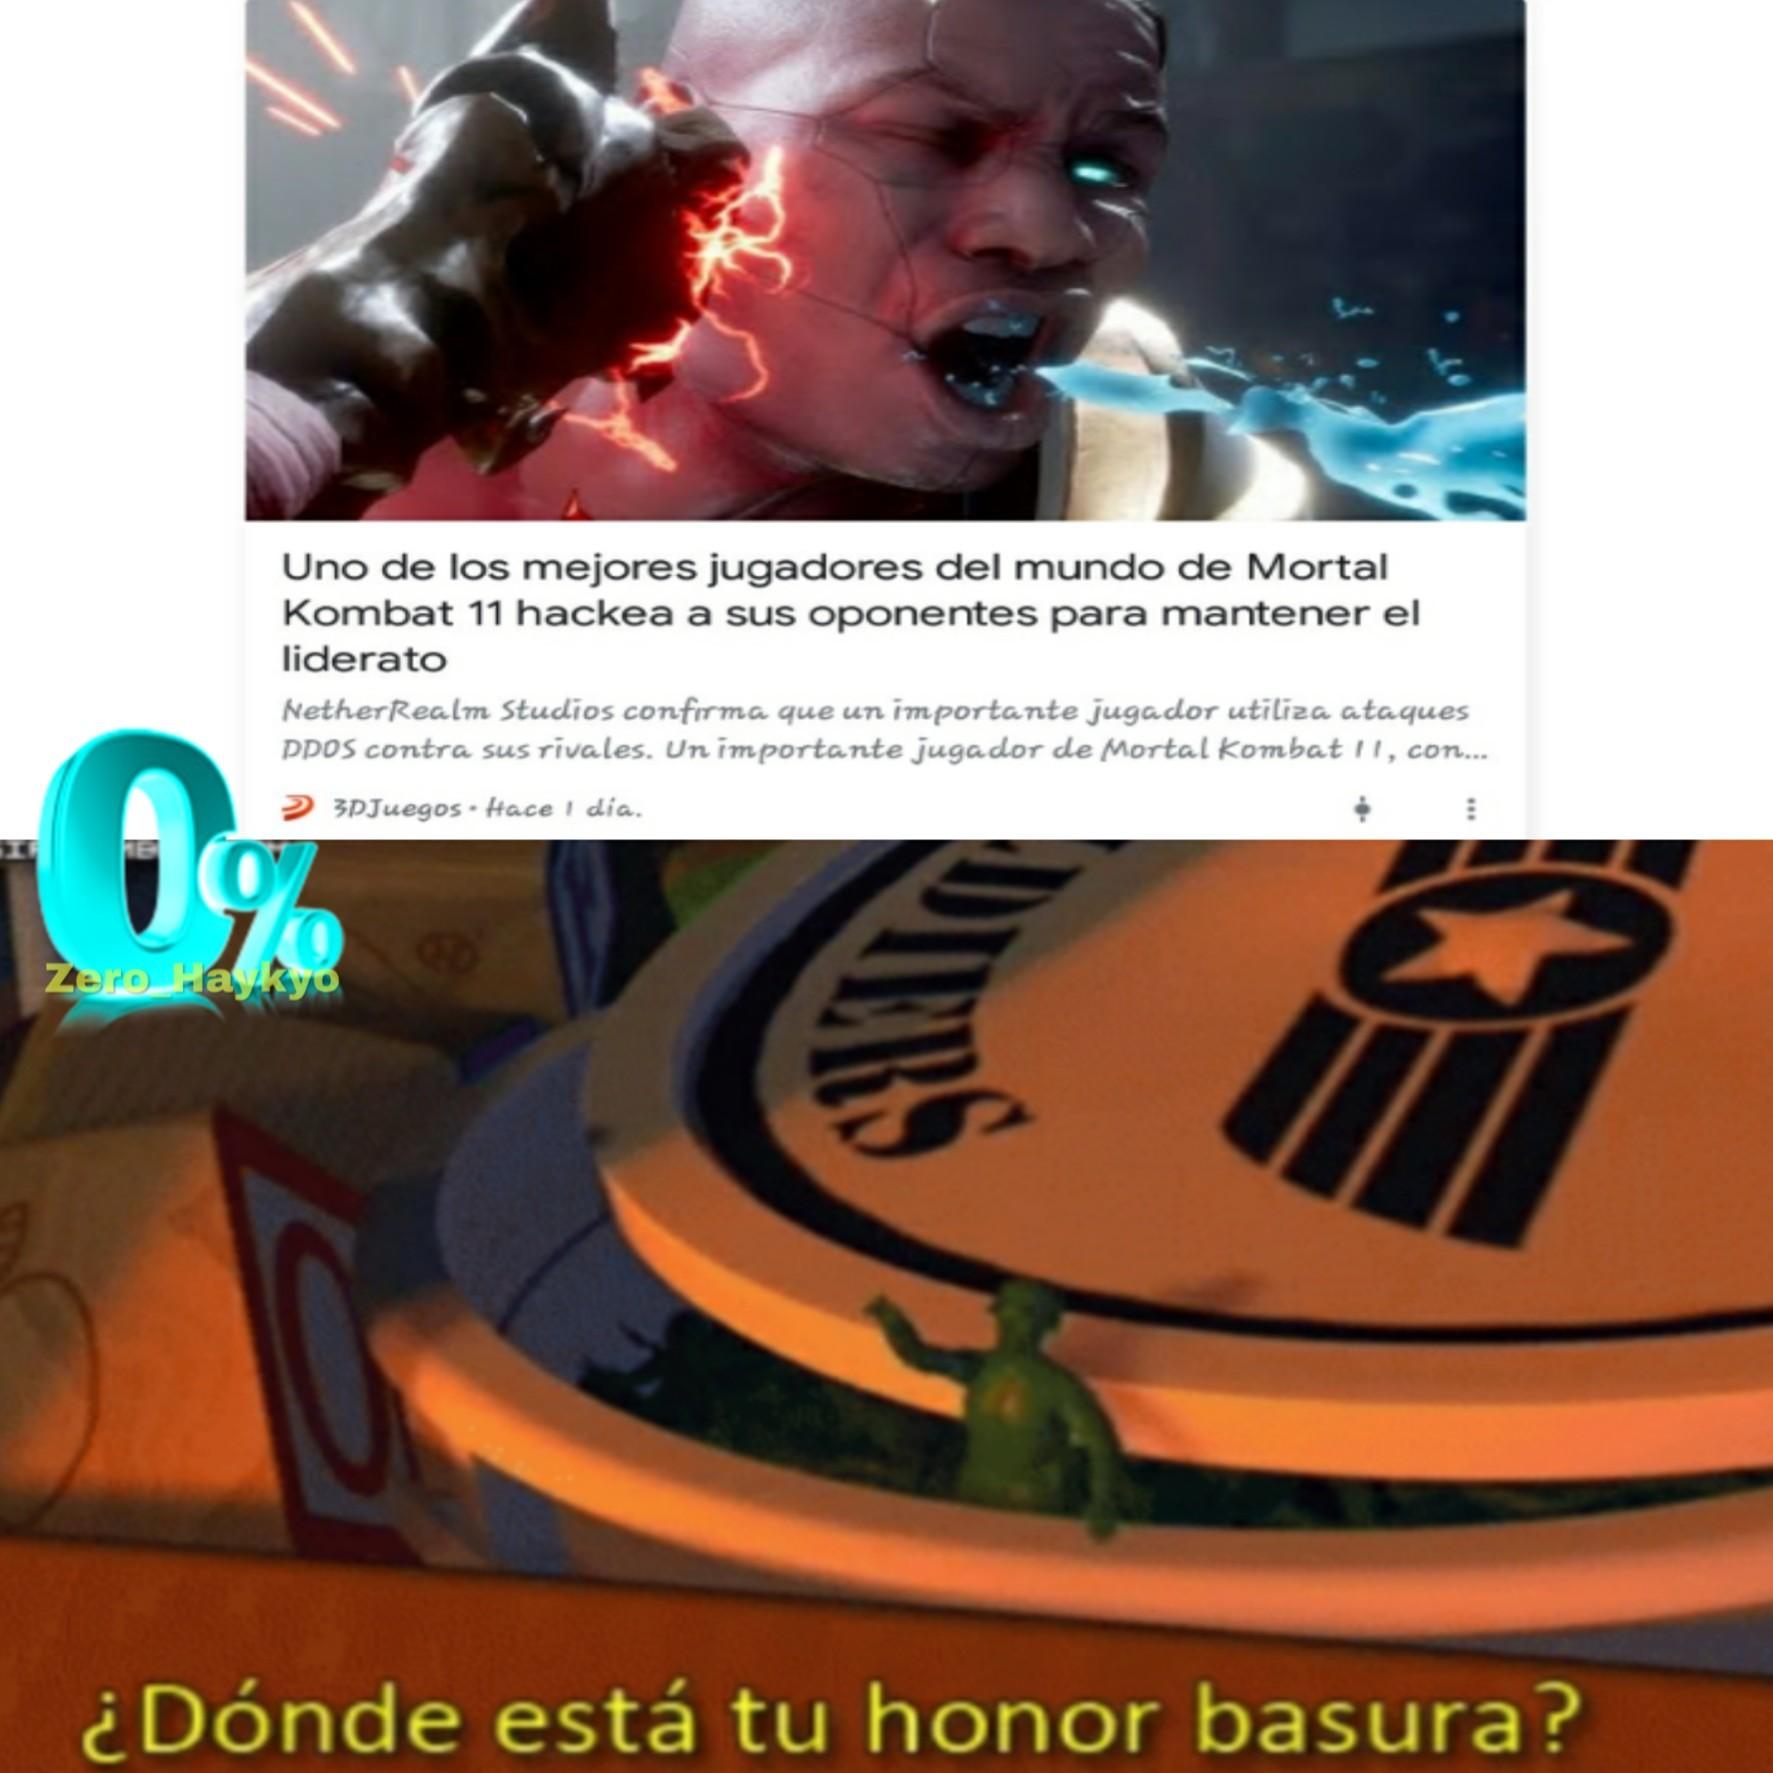 Donde está tu honor - meme